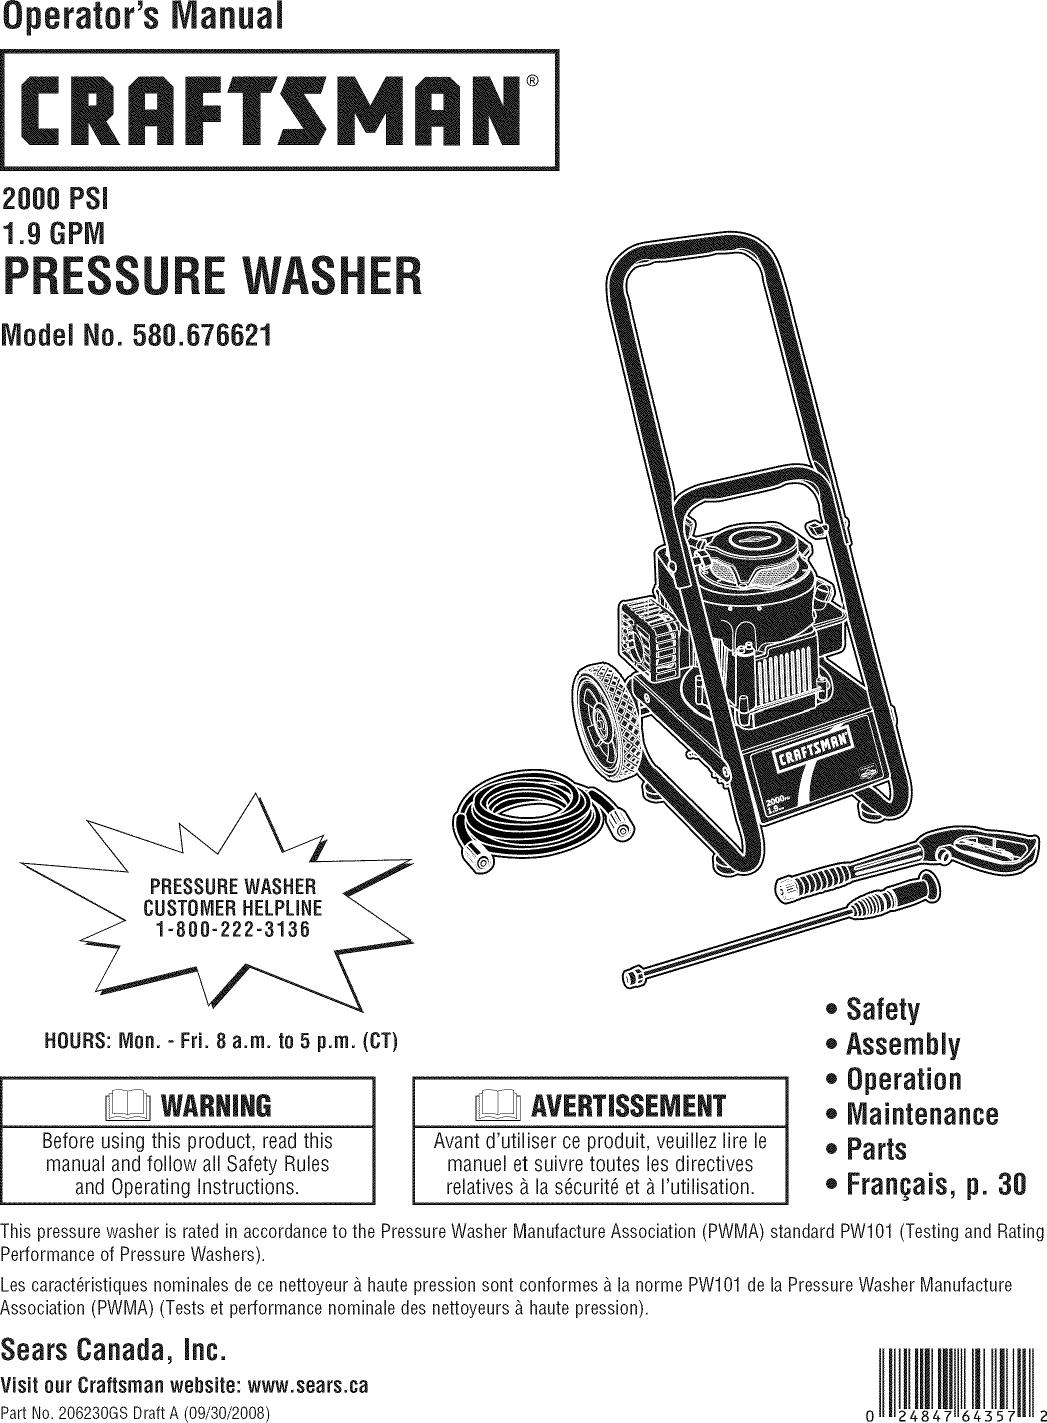 yamaha pressure washer owners manual